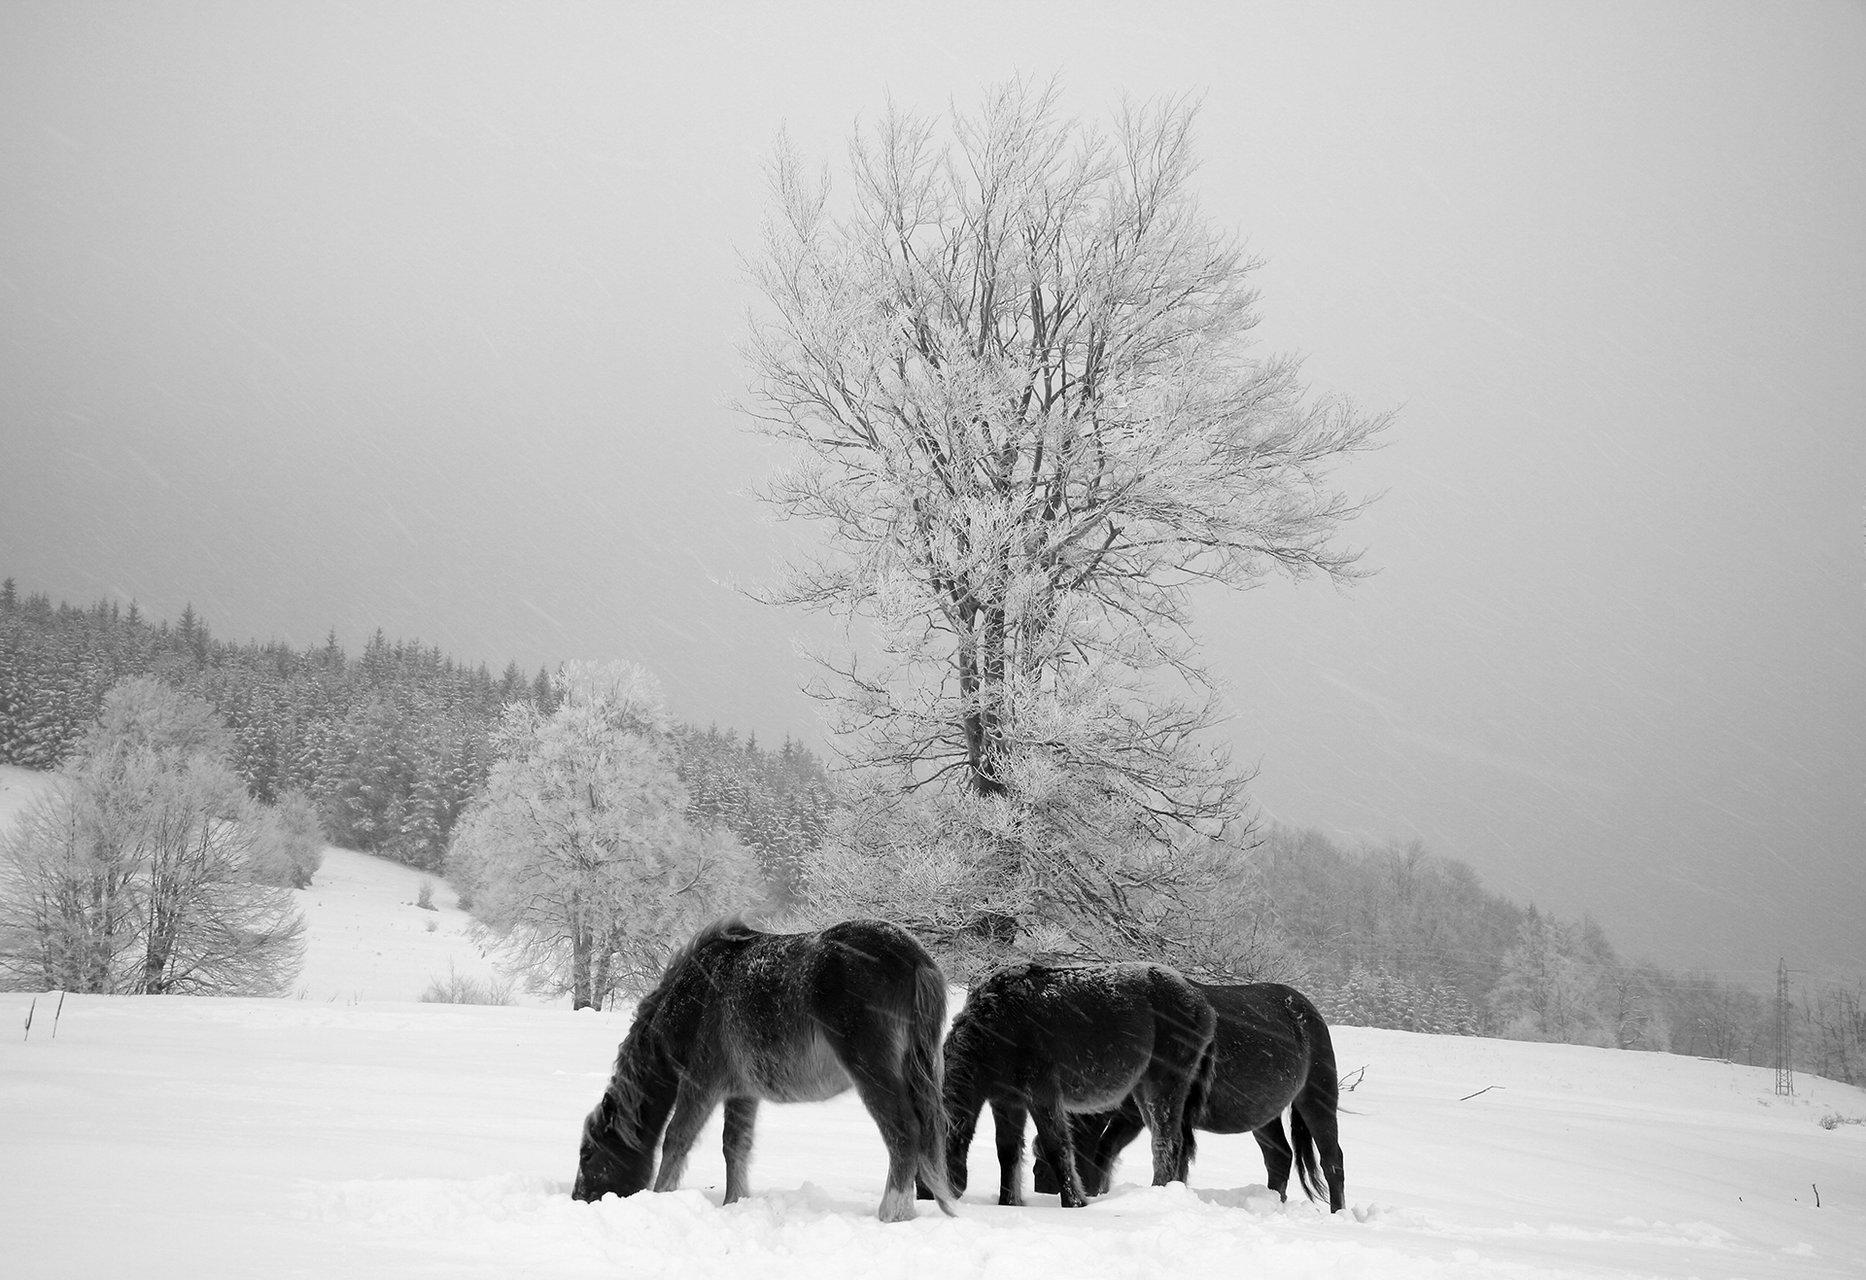 ,,Frozen''(,,Замръзнали'') от емилиян евдокимов - evdokimov_emo